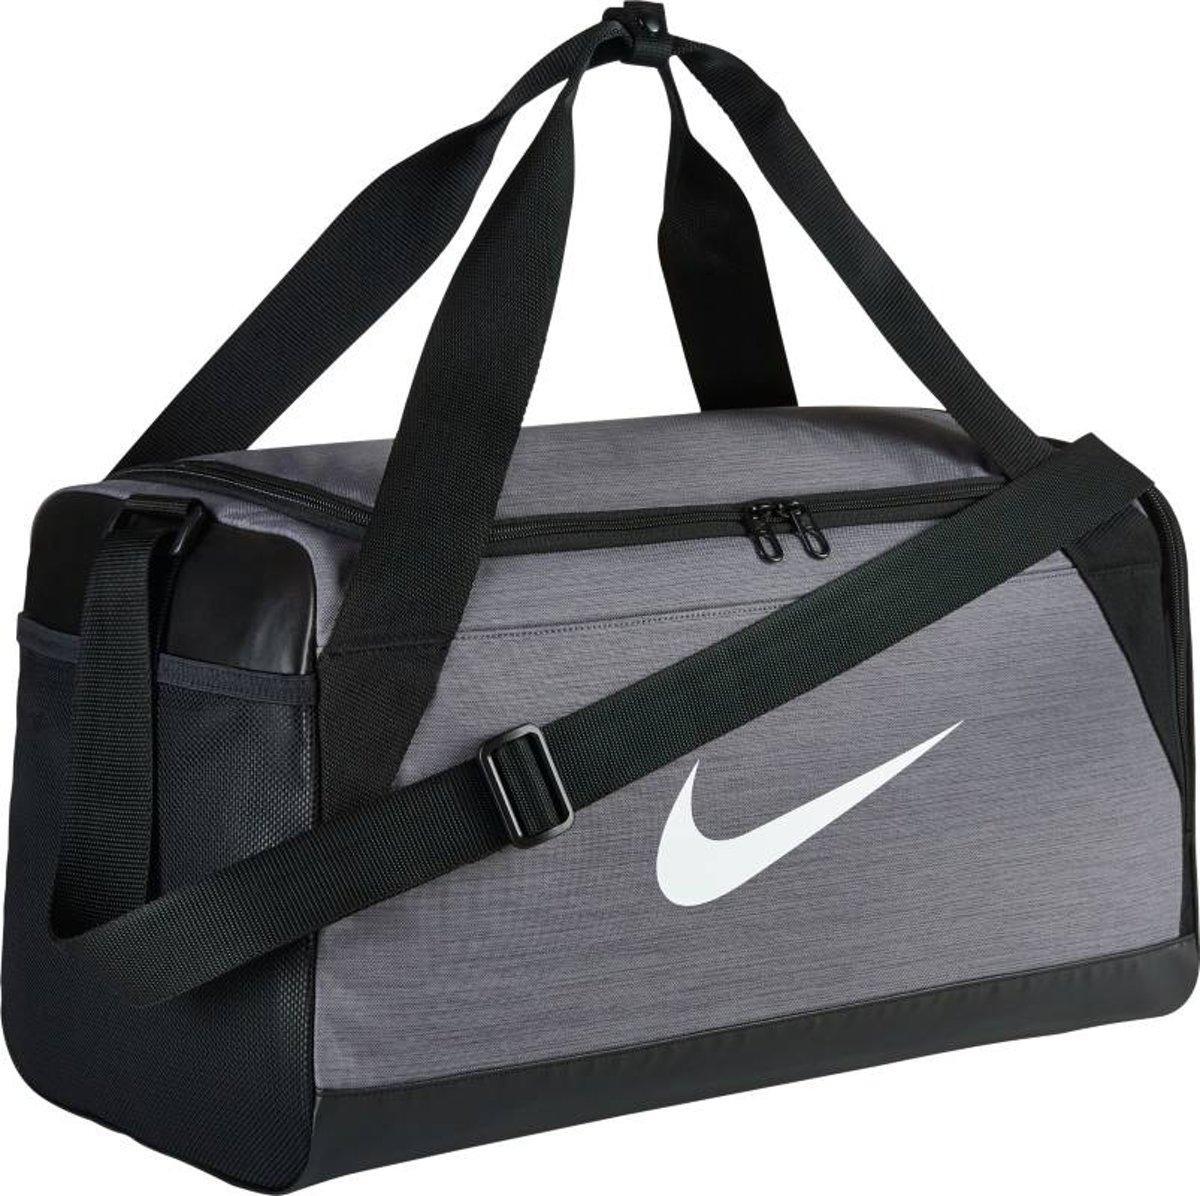 a40177e8294 bol.com | Nike Sporttas kopen? Alle Sporttassen online